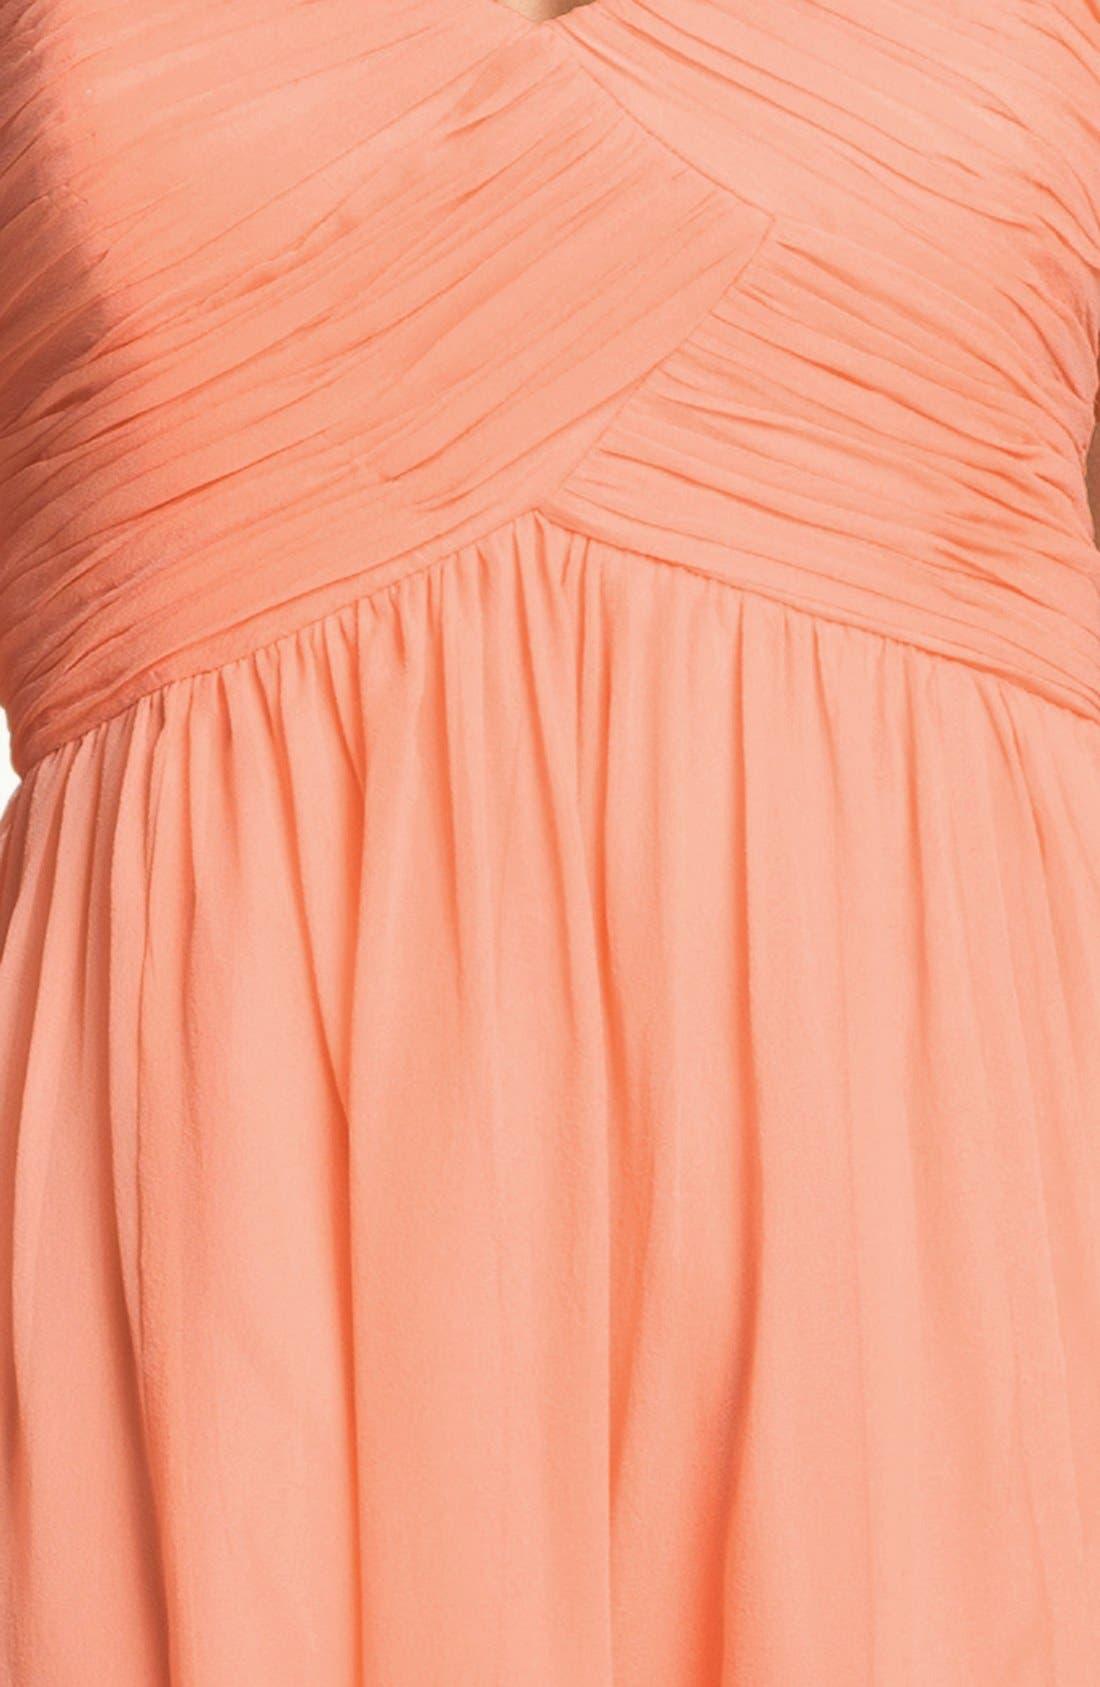 'Morgan' Strapless Silk Chiffon Dress,                             Alternate thumbnail 92, color,